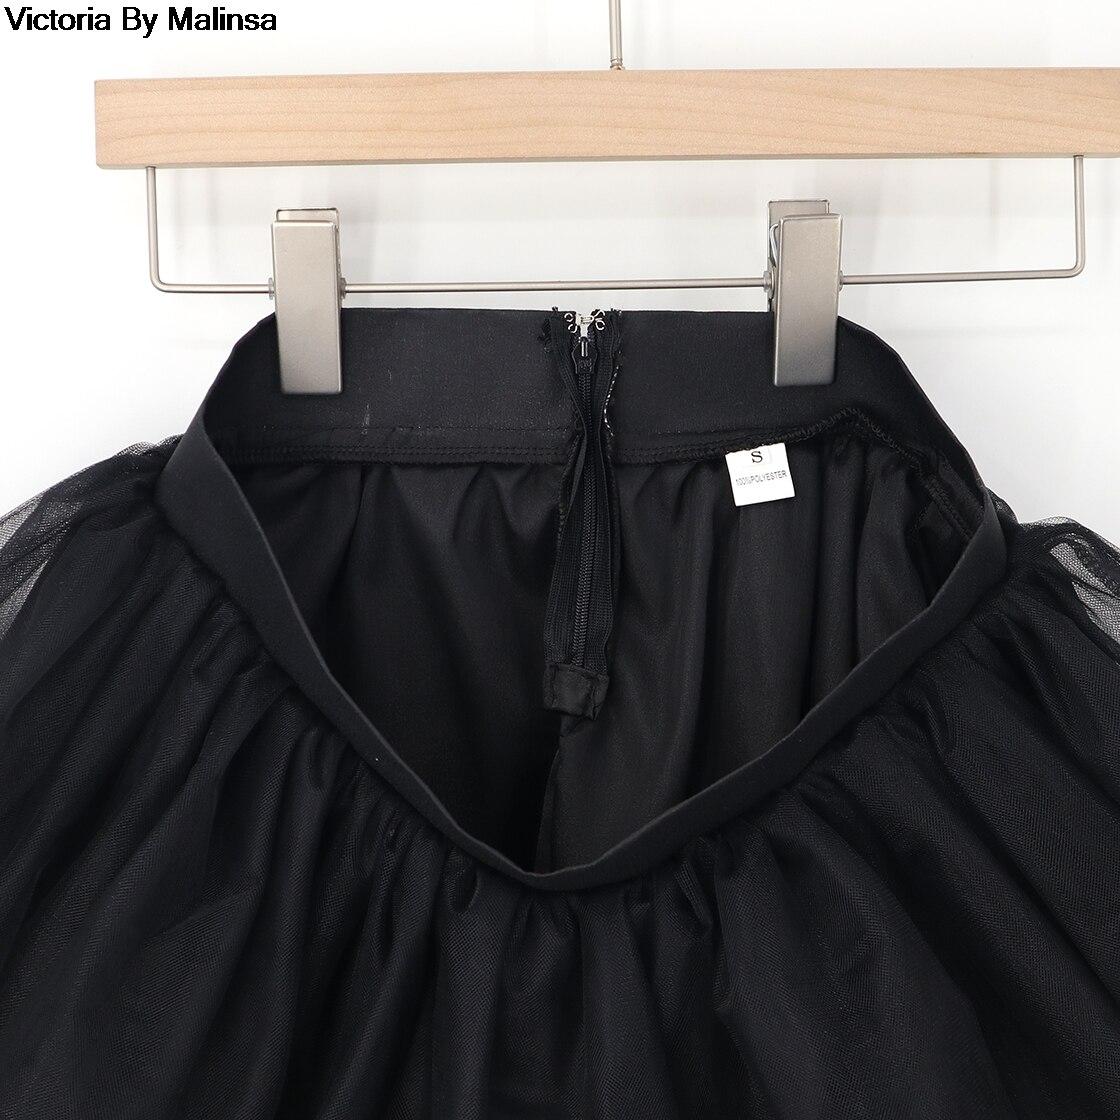 Image 5 - تنورة صغيرة من التول باللون الأبيض للنساء ، تنورة قصيرة منتفخة من قماش التول ، تنورة قصيرة منتفخة من قماش التتوتو مصنوعة حسب الطلب-في تنانير من ملابس نسائية على AliExpress